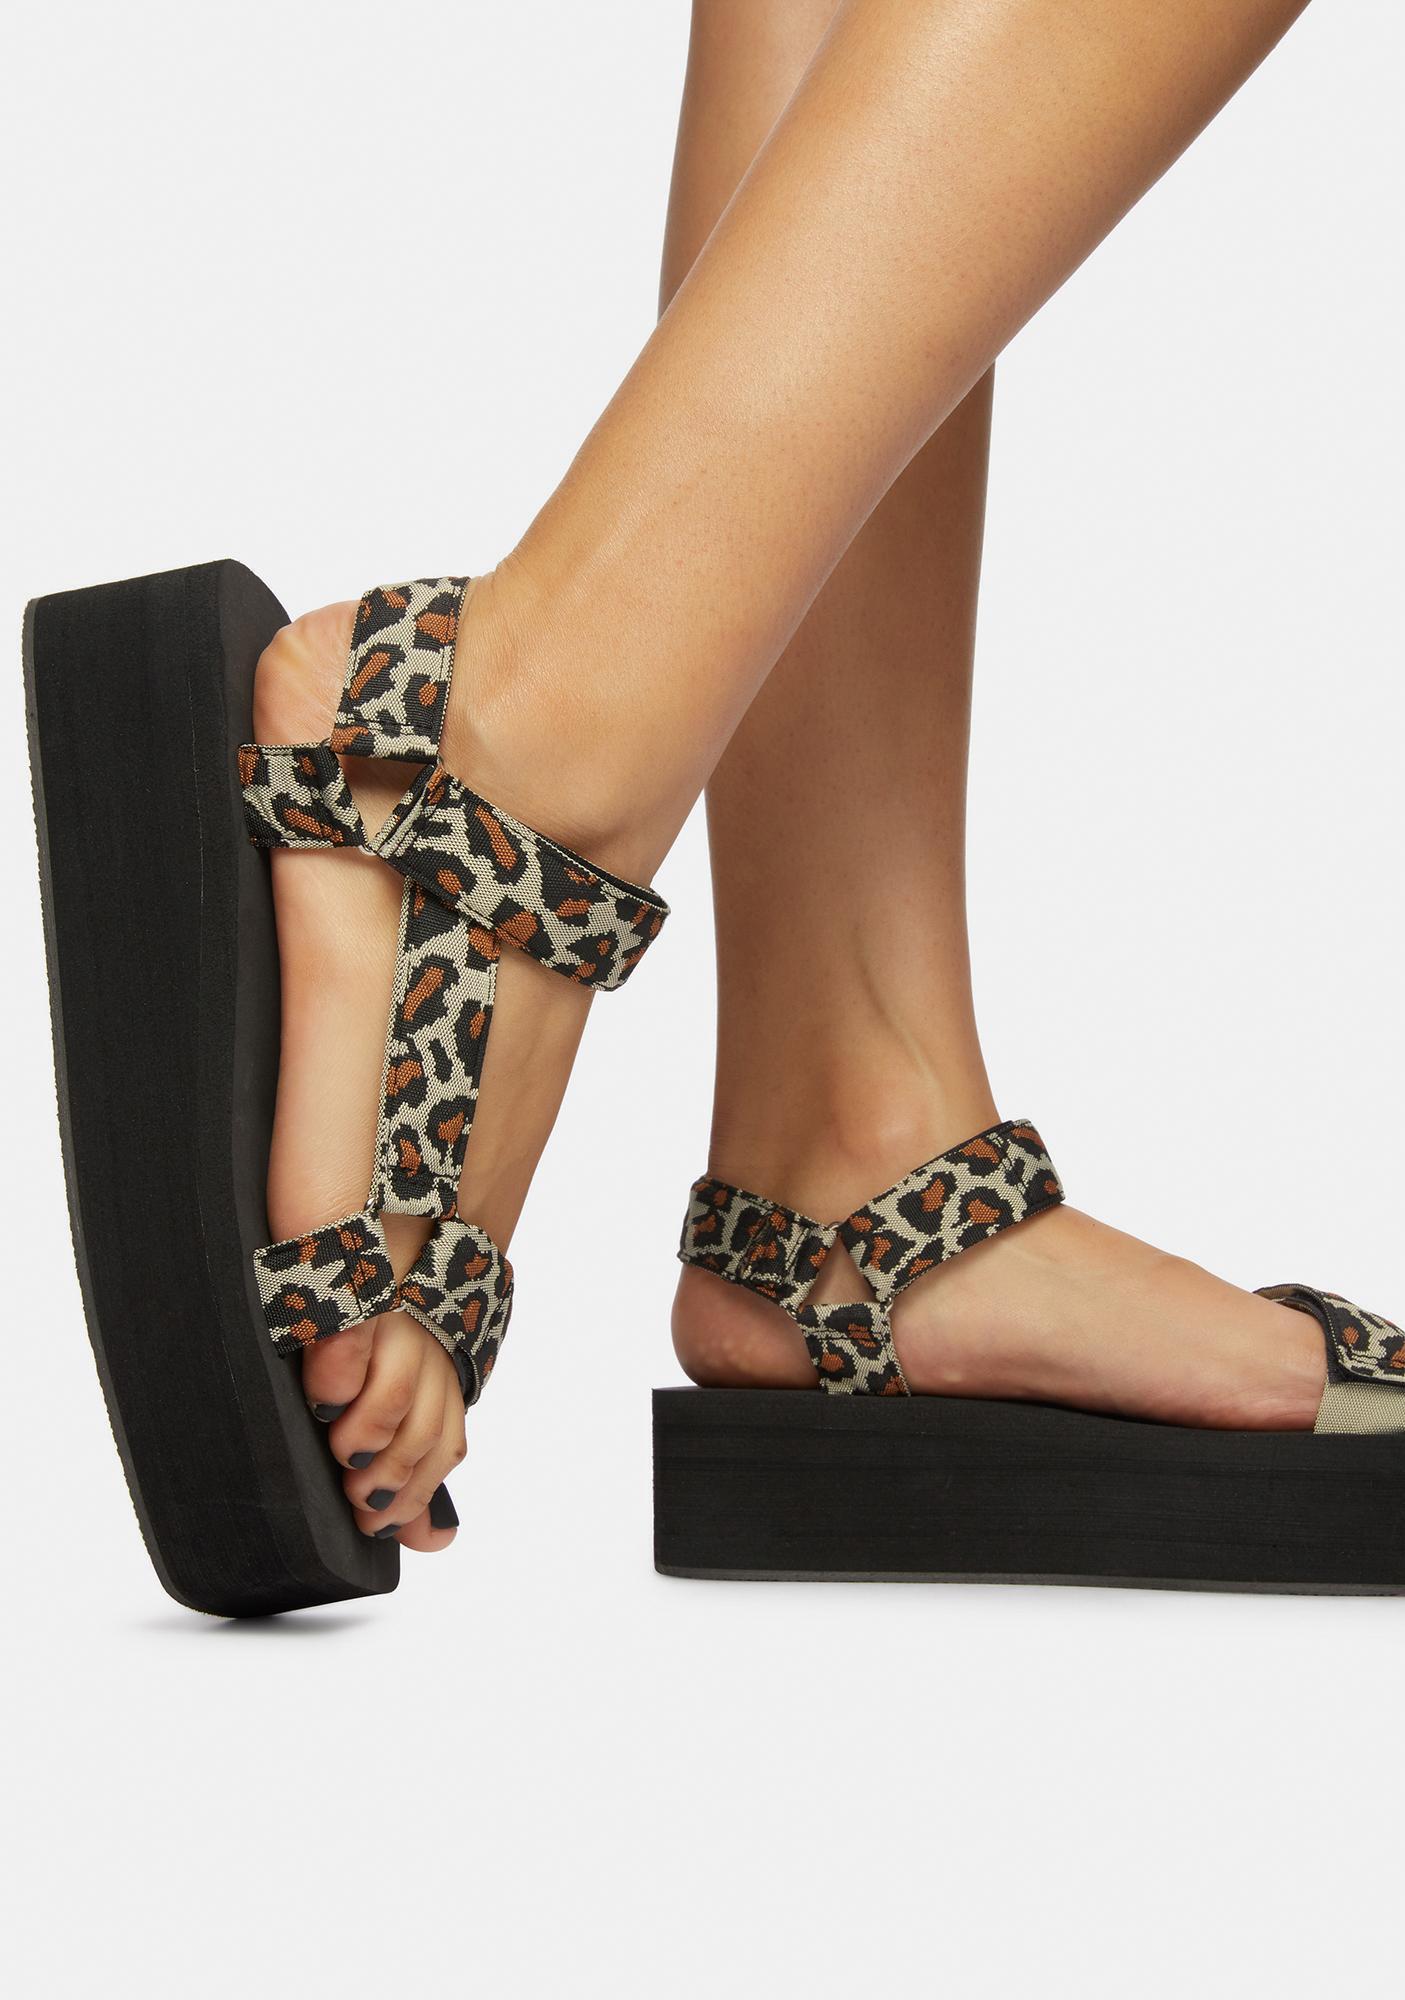 Purrfect Leopard Gonna Getcha Platform Sandals